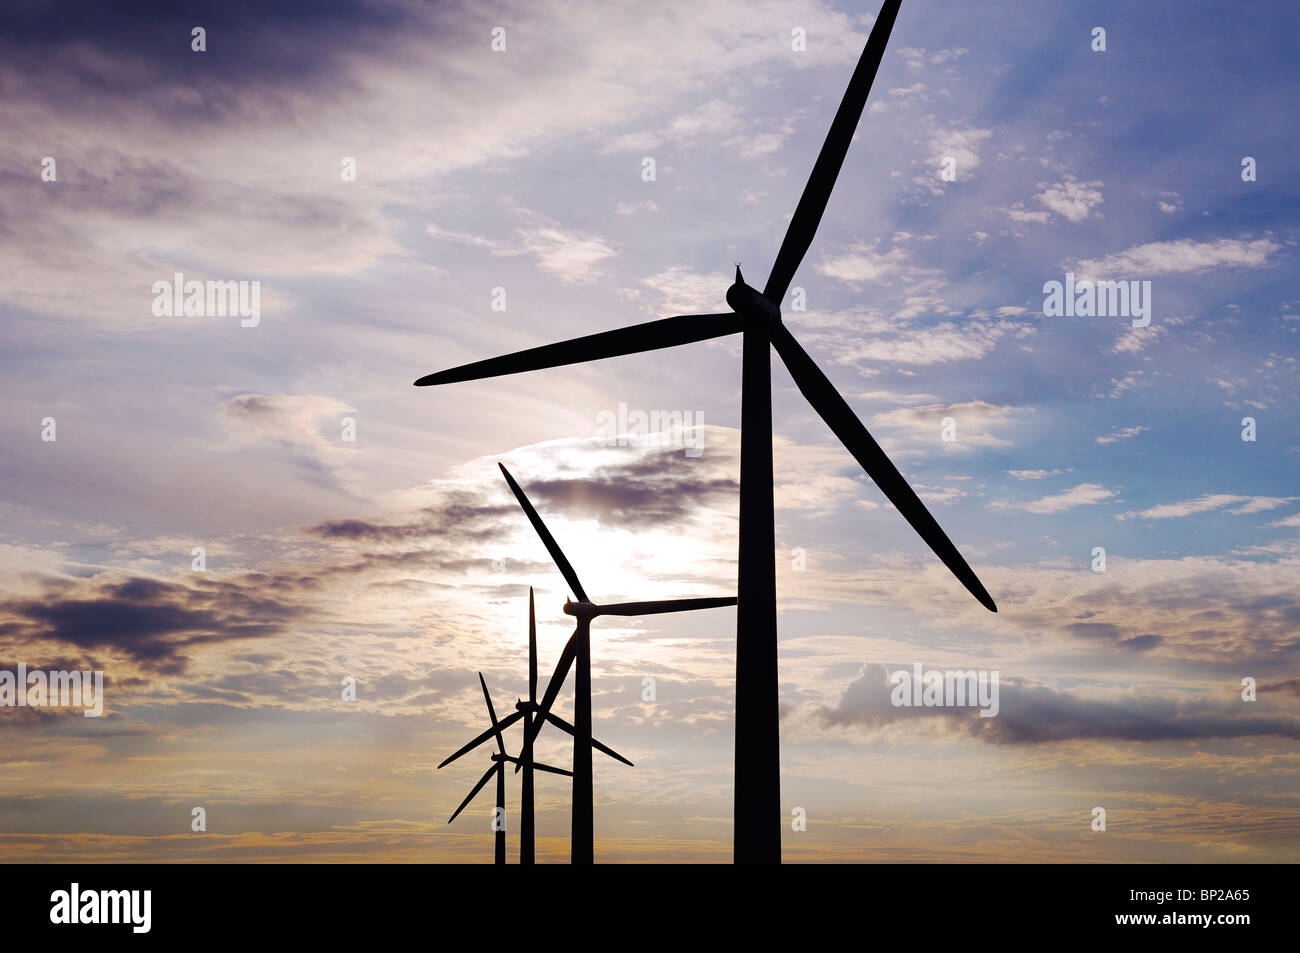 Éoliennes, Watchfield, Royaume-Uni. Photo Stock